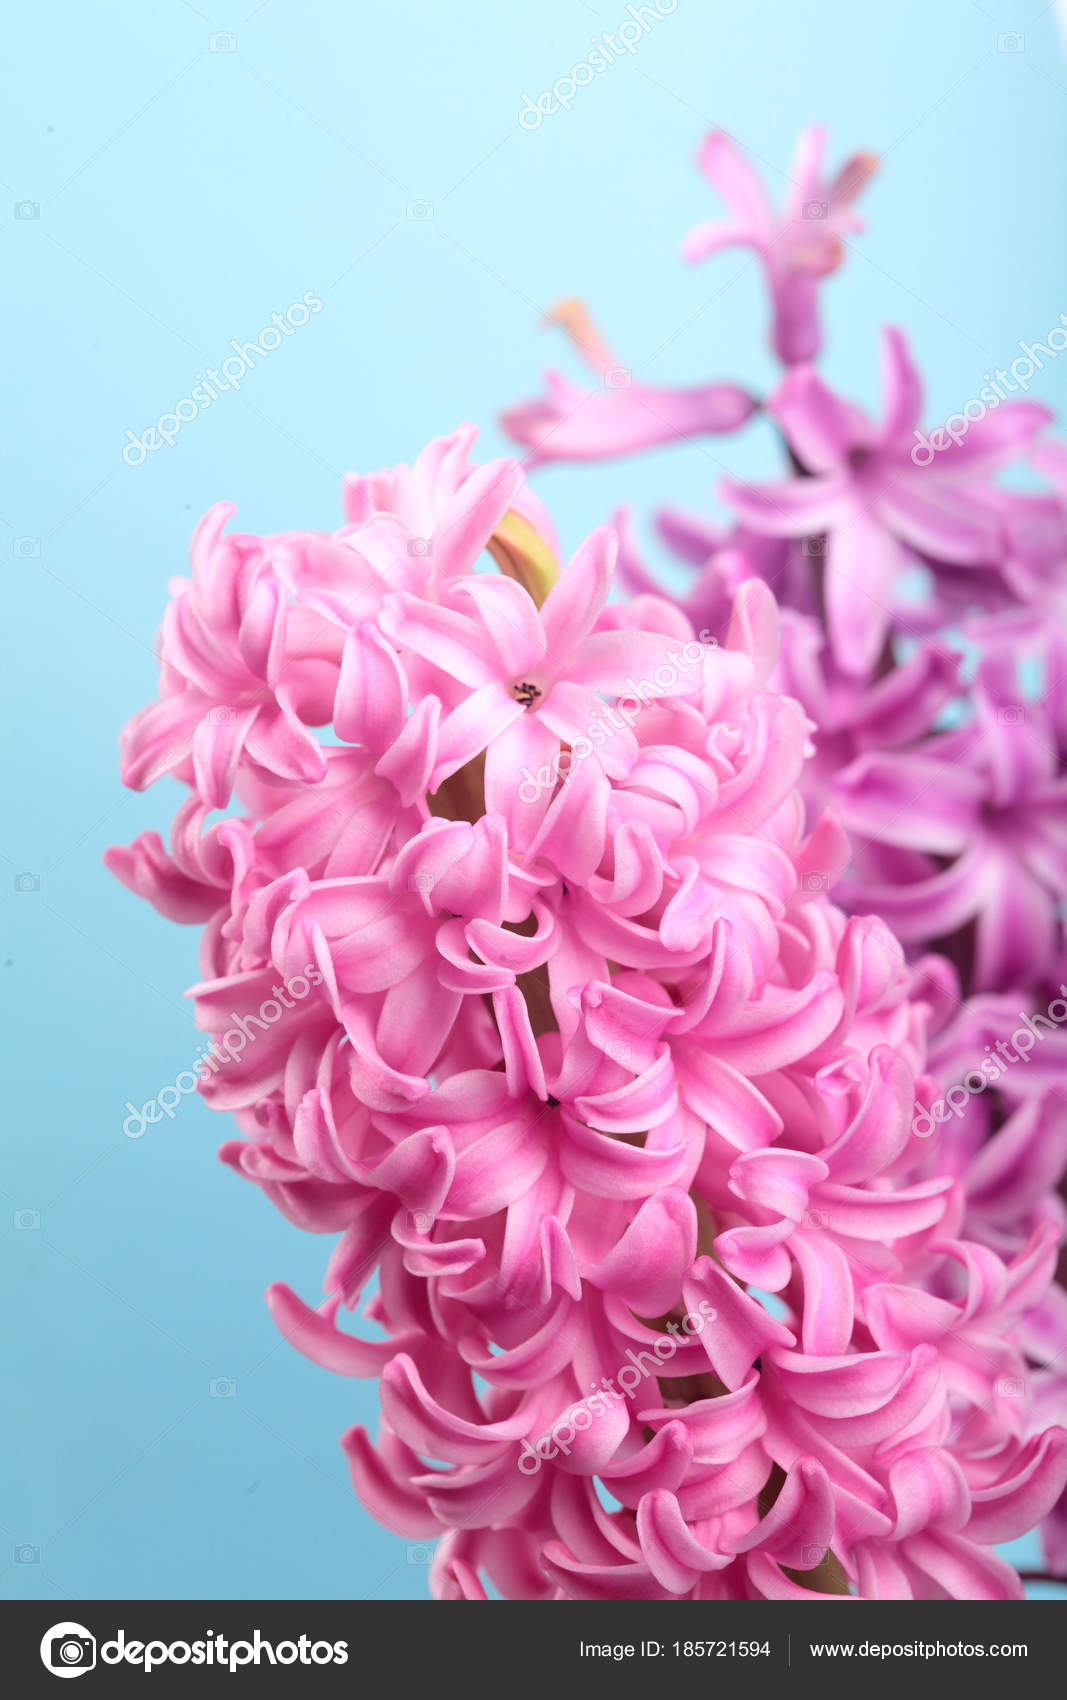 Hyacinth pink surprise and violet dutch hyacinth spring flowers hyacinth pink surprise and violet dutch hyacinth spring flowers the perfume of blooming hyacinths mightylinksfo Gallery